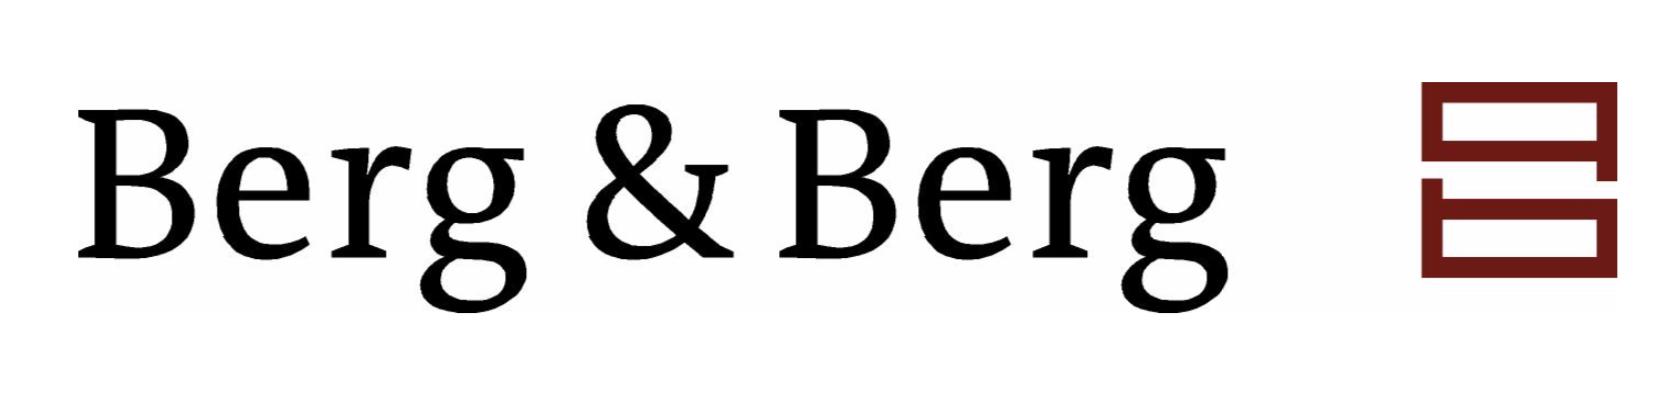 Logo berg & berg